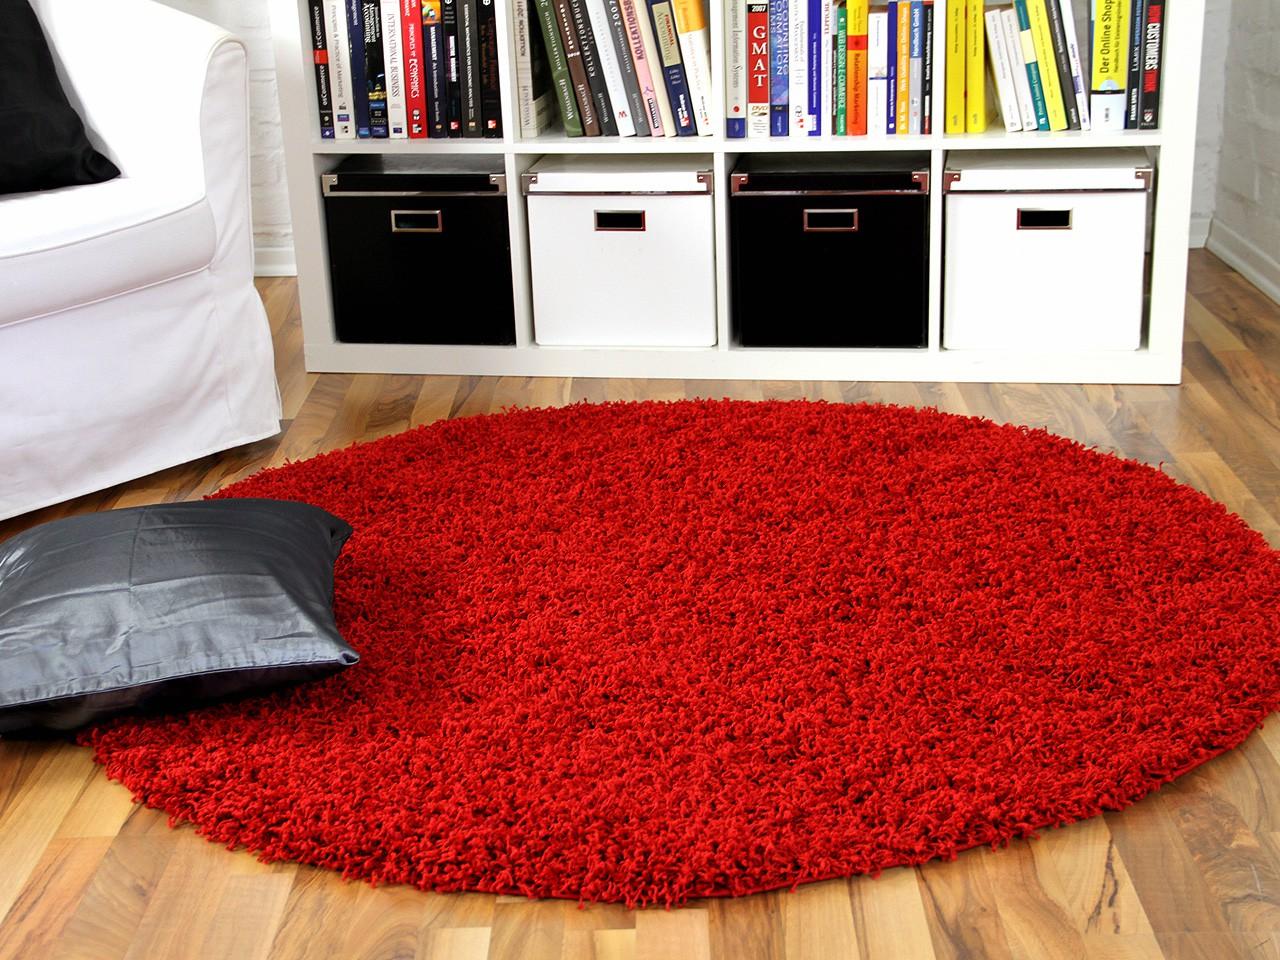 hochflor langflor shaggy teppich aloha rot rund ebay. Black Bedroom Furniture Sets. Home Design Ideas